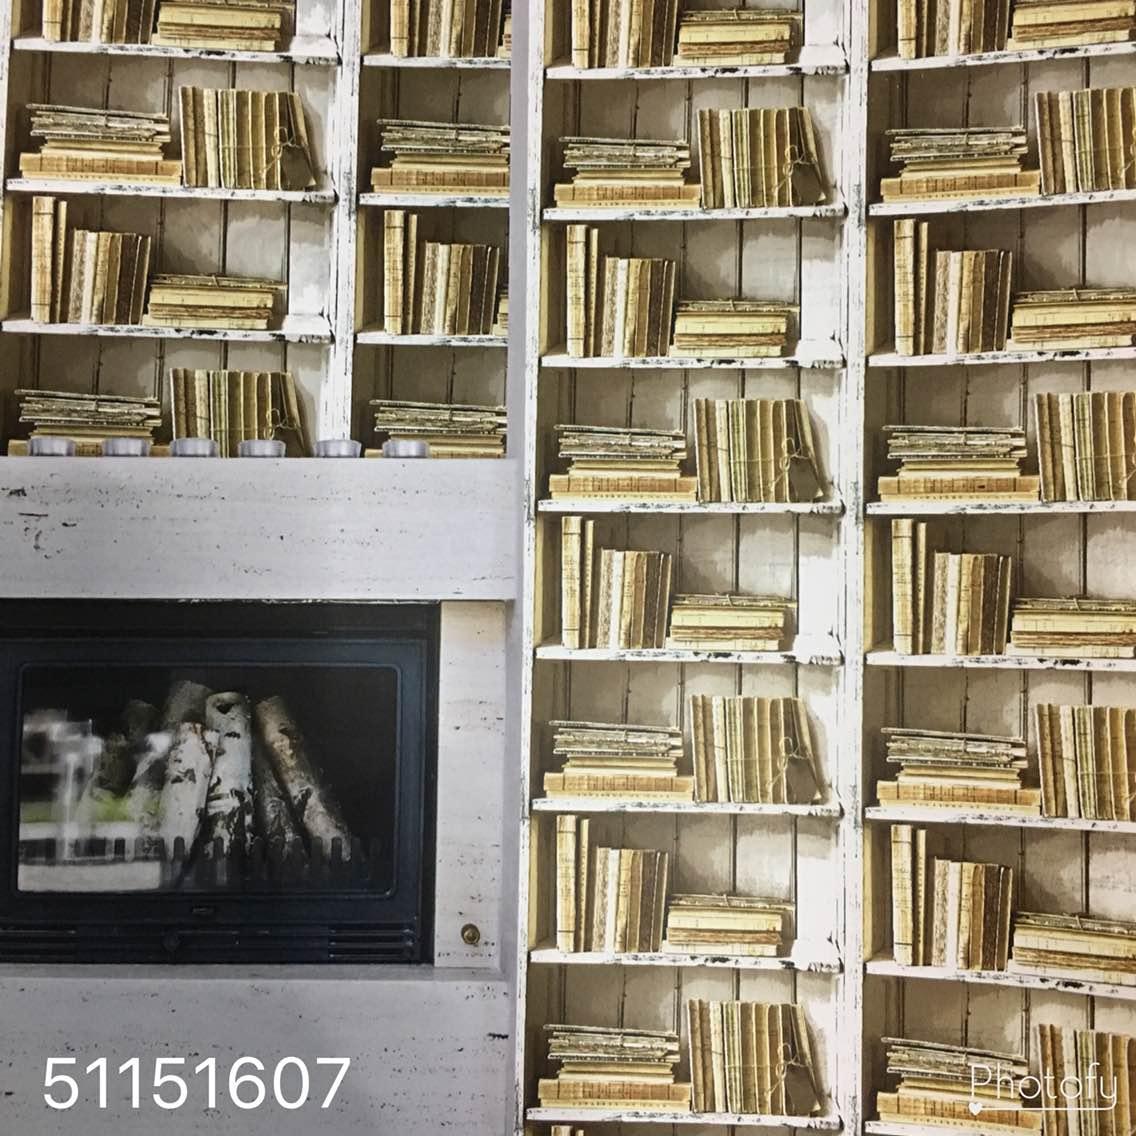 Best Imported Wallpaper supplier in Delhi.   Book shelfs imported wallpapers from Reality2 wallpapers.   A wallking wallpaper supplier in India.   To buy call us  Wallparadise-  wallking wallpaper supplier.